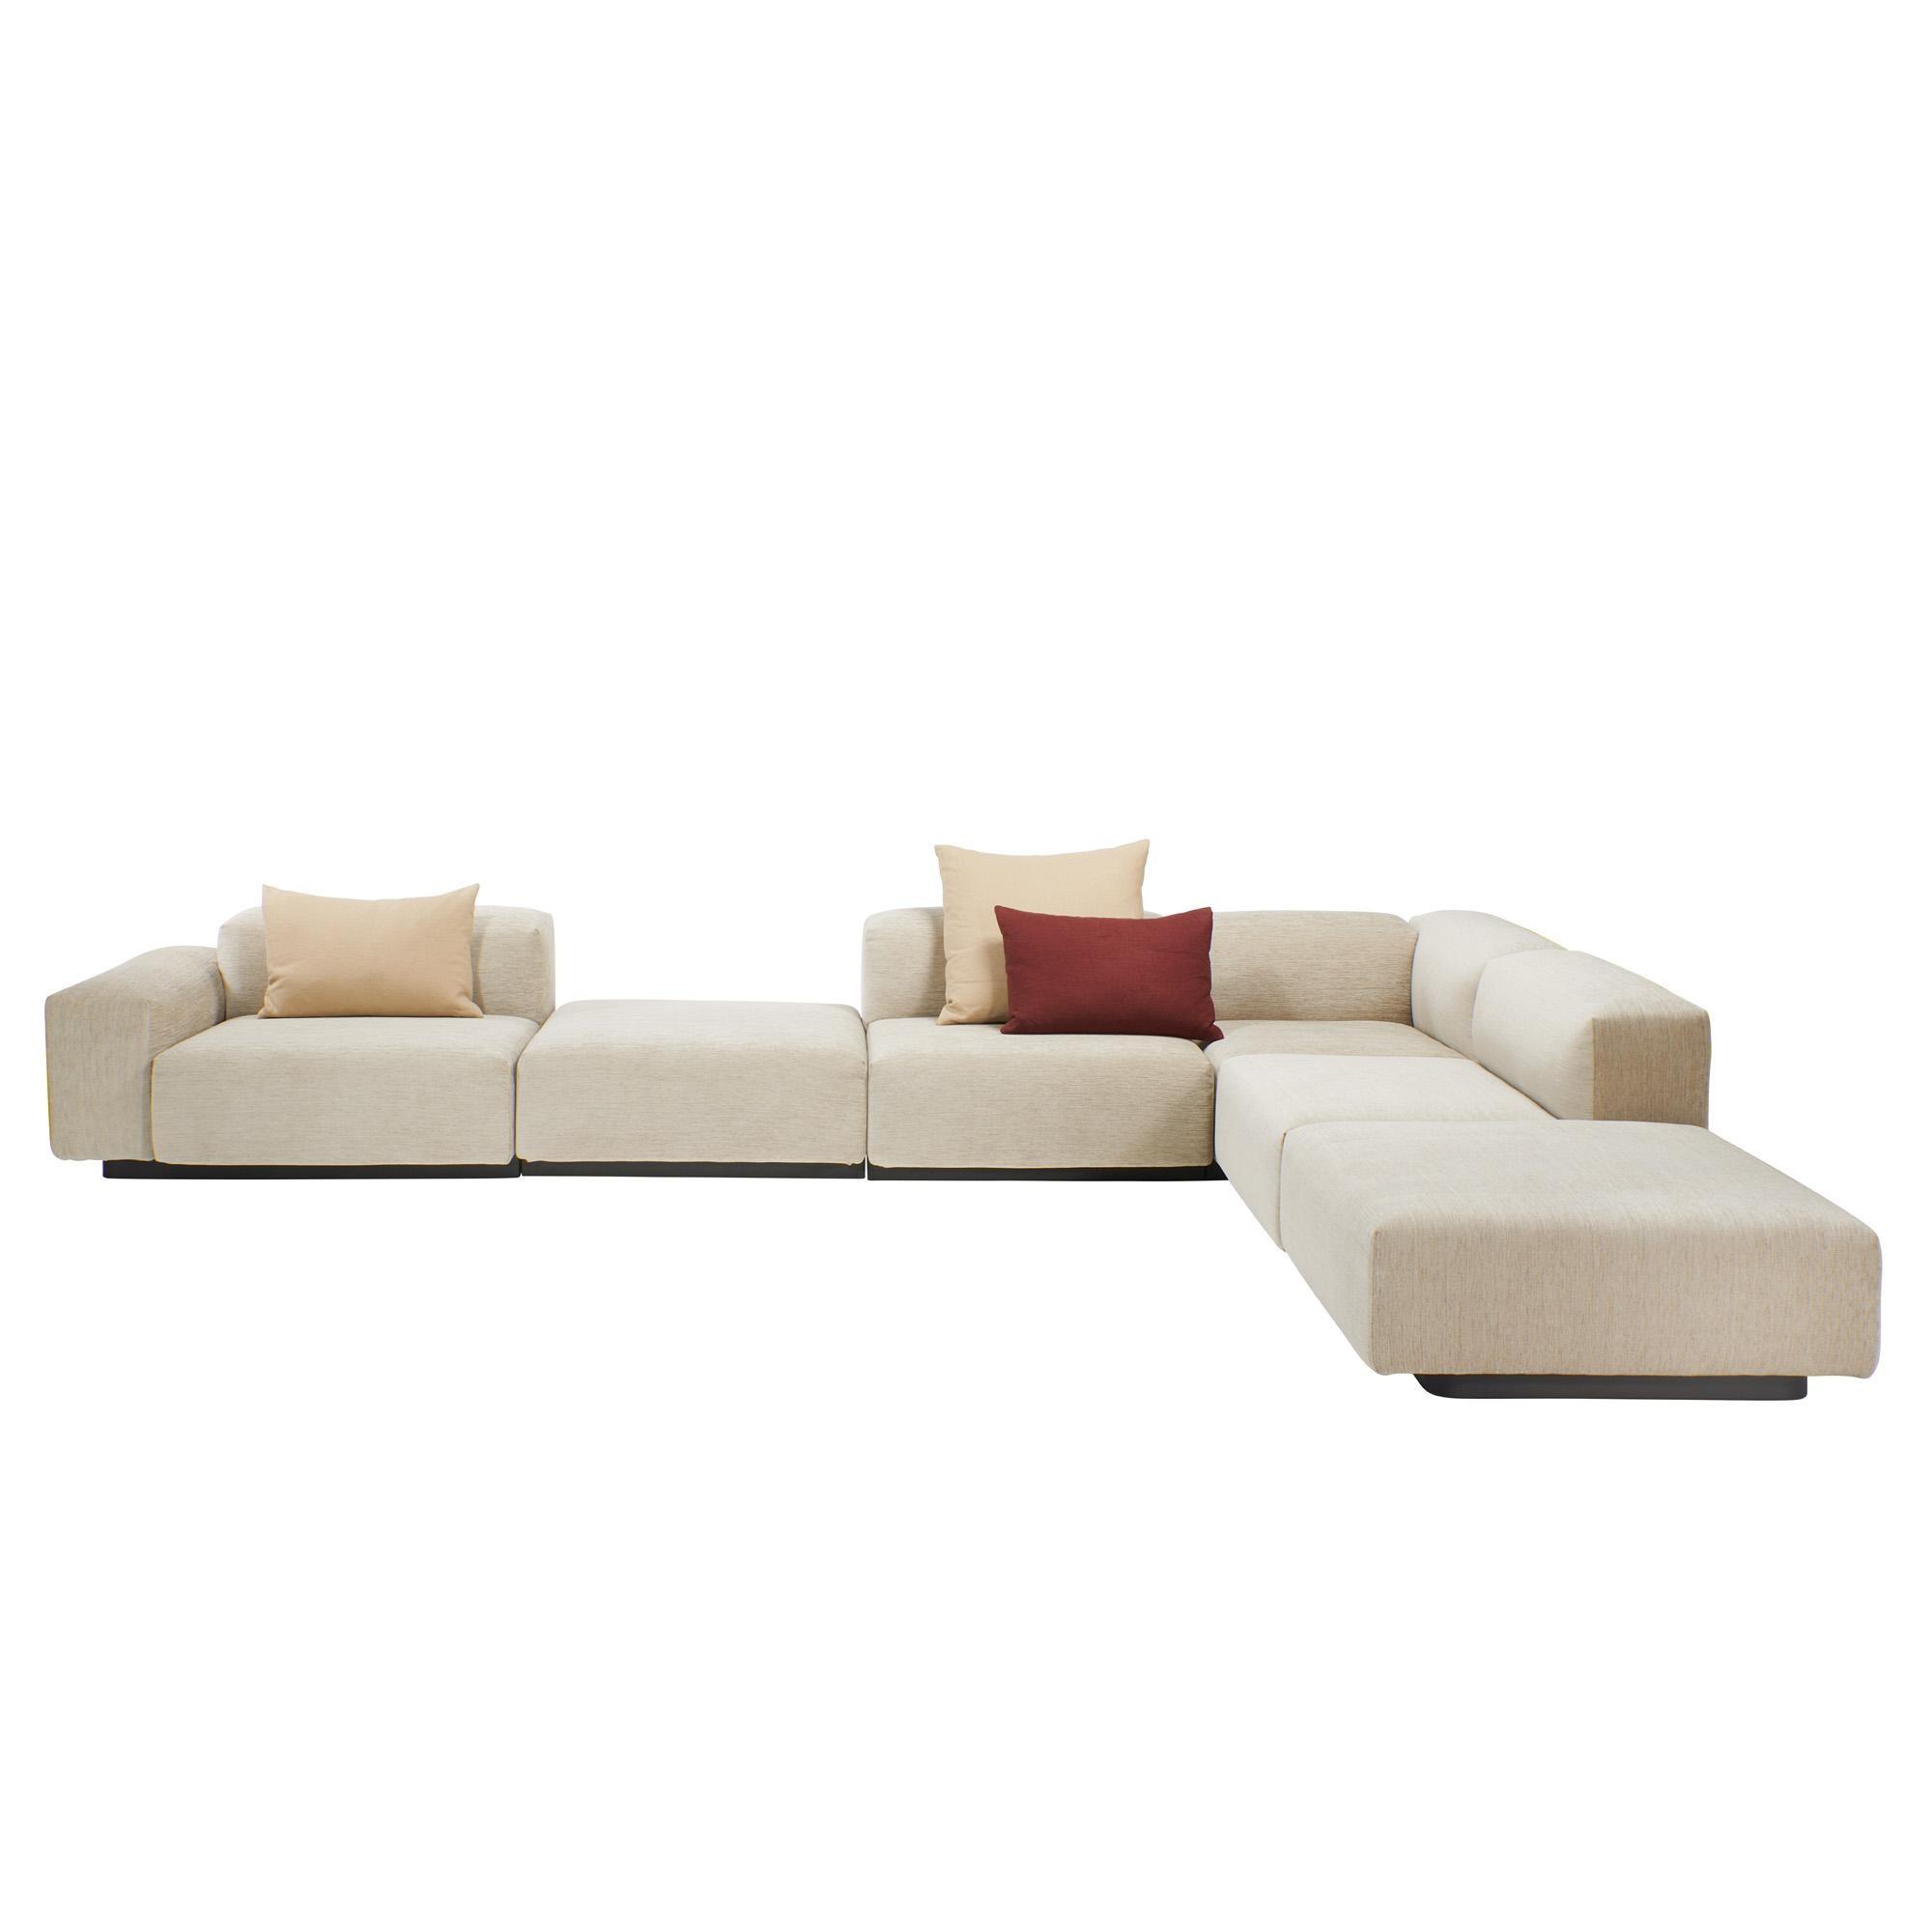 Vitra Soft Modular Corner Sofa   AmbienteDirect